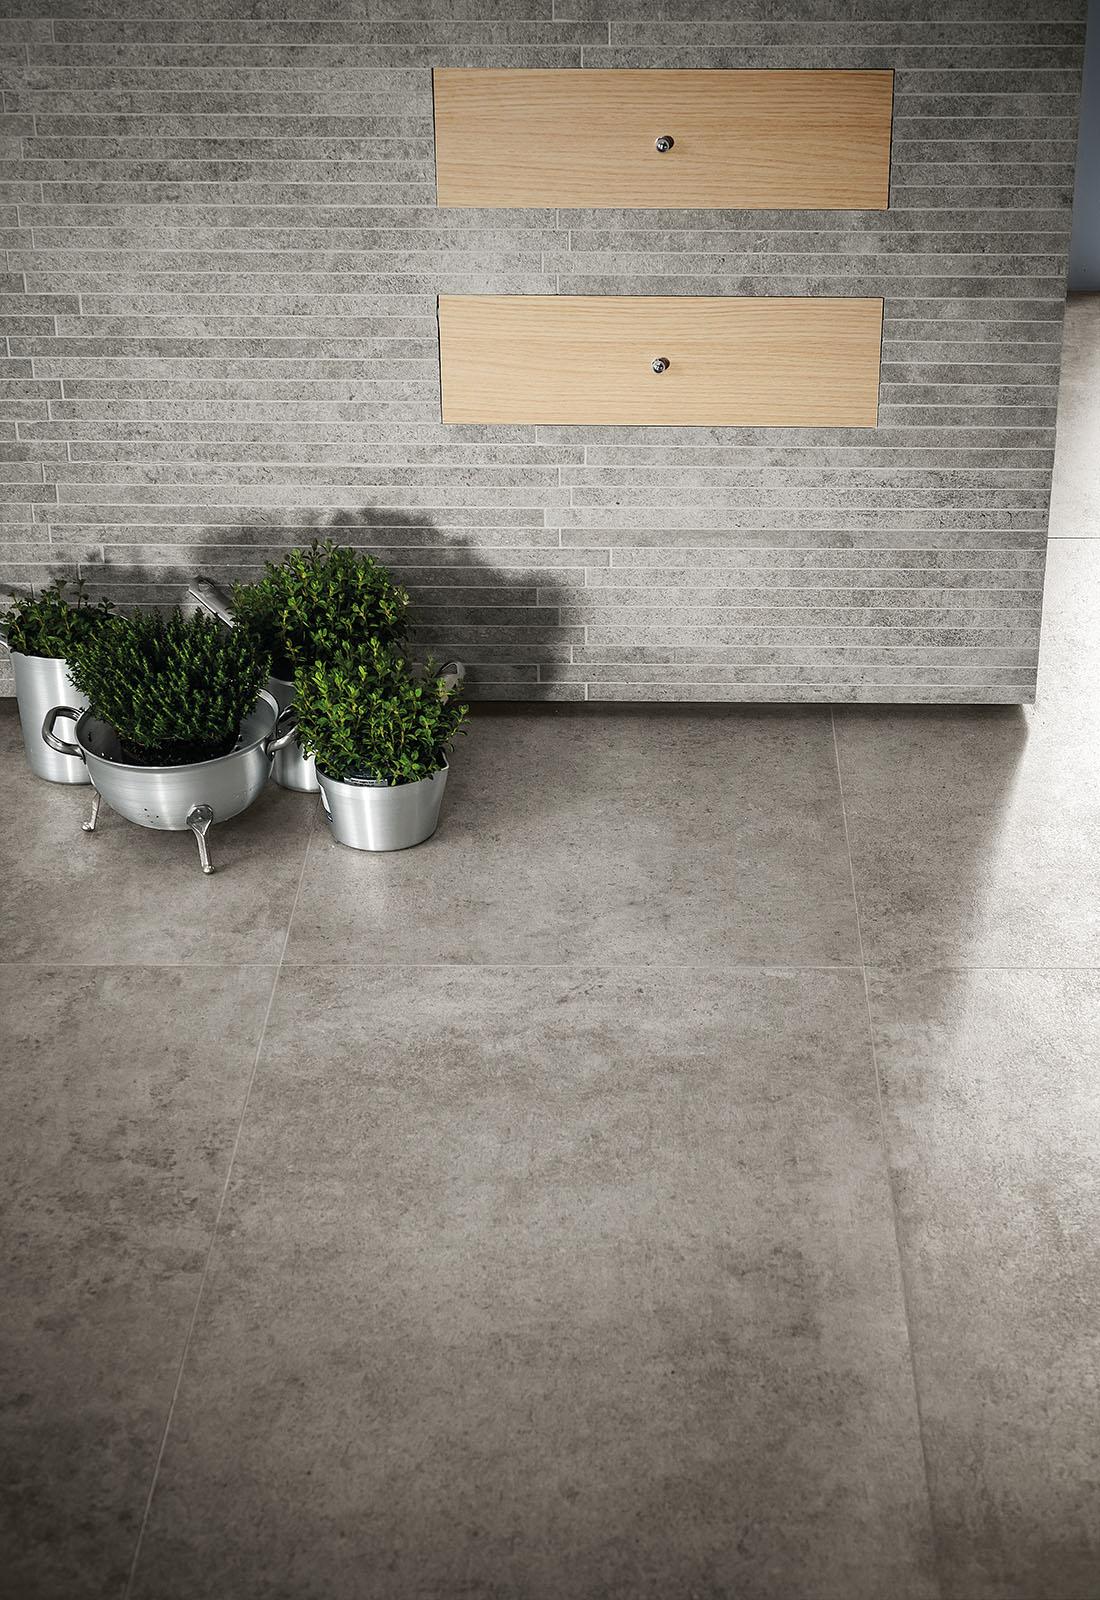 Brooklyn porcelain stoneware flooring marazzi brooklyn ceramic tiles marazzi4703 dailygadgetfo Image collections